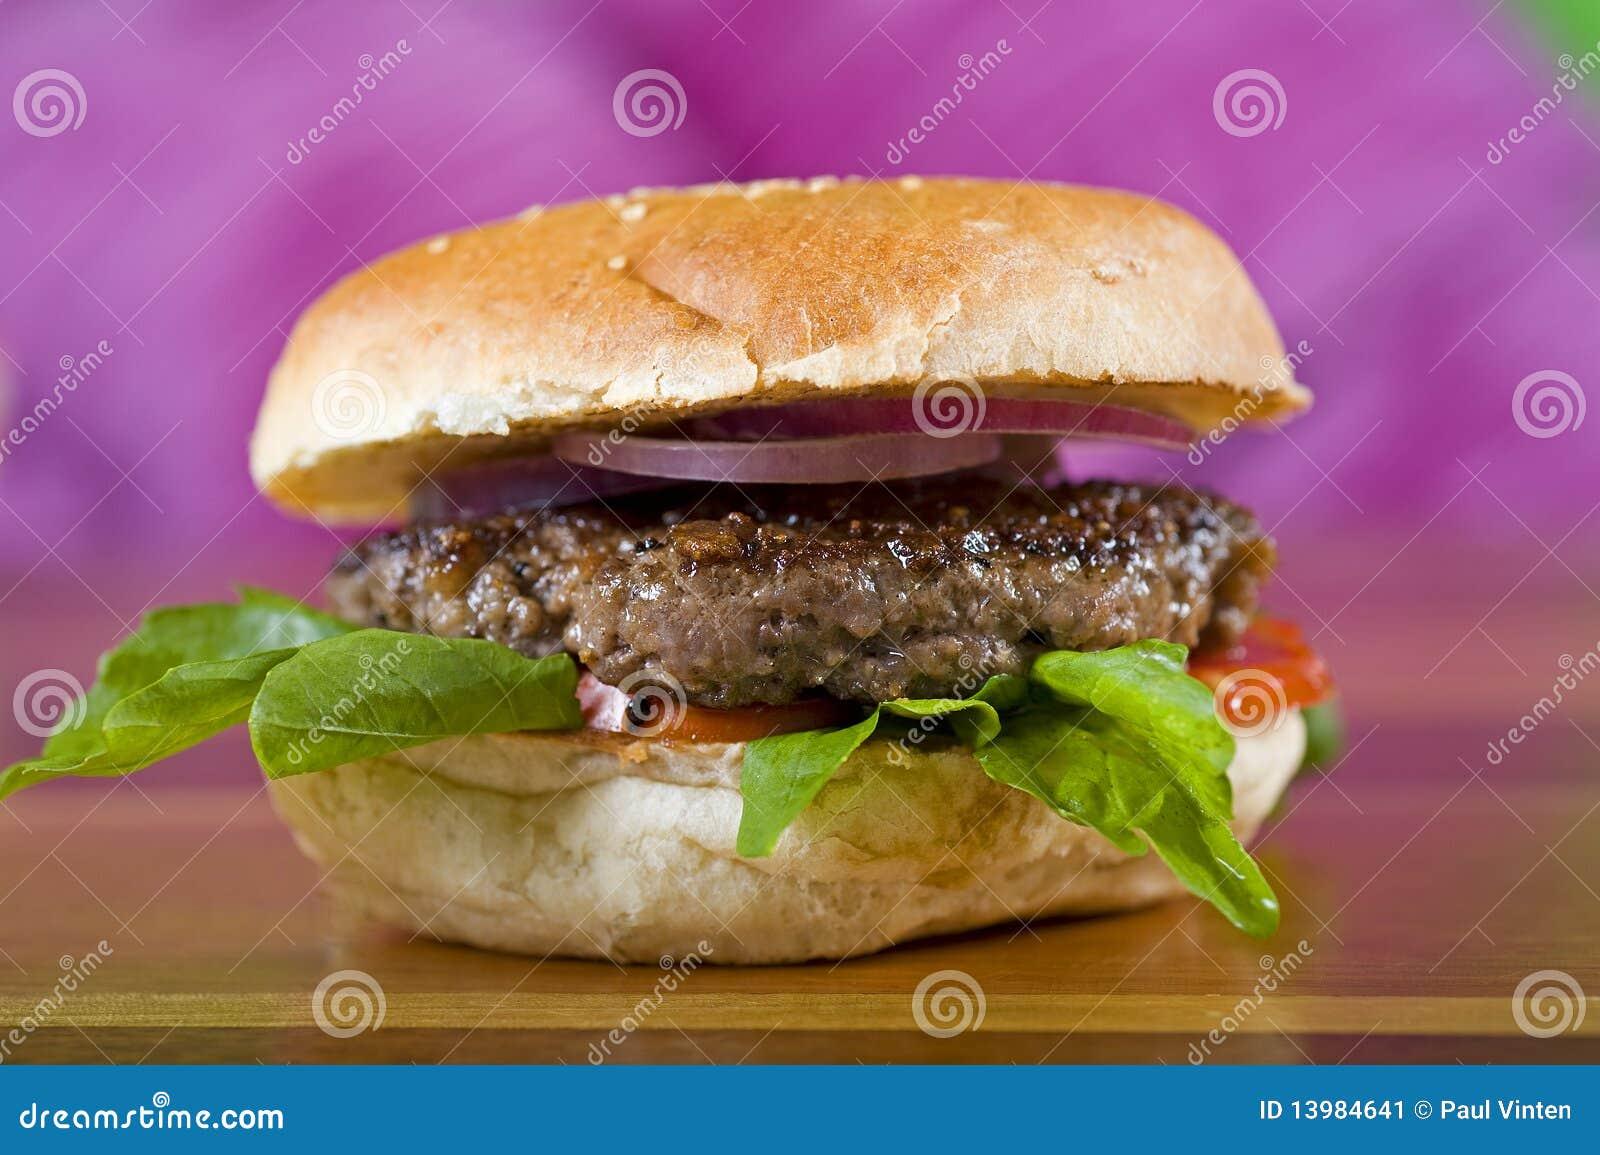 beef burger in a bread bun stock image image 13984641. Black Bedroom Furniture Sets. Home Design Ideas